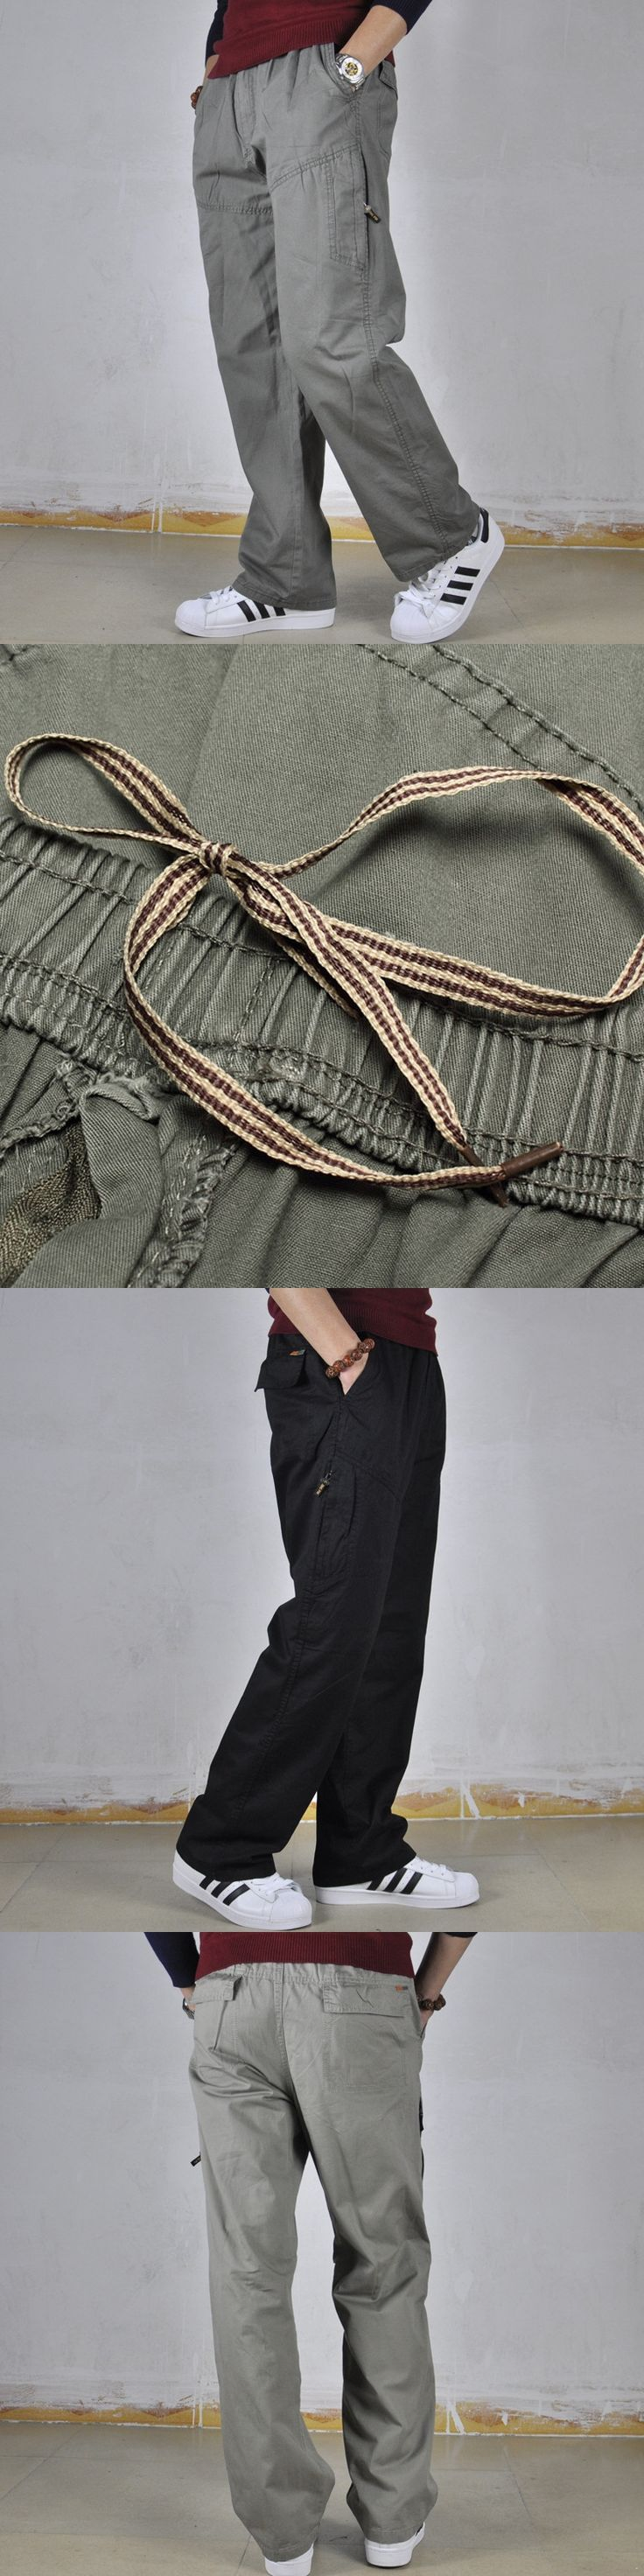 Mens Harem Pants 2017 Men's Fashion Personality Dress Leisure Plus Size Mallas Fitness Hombre Trousers